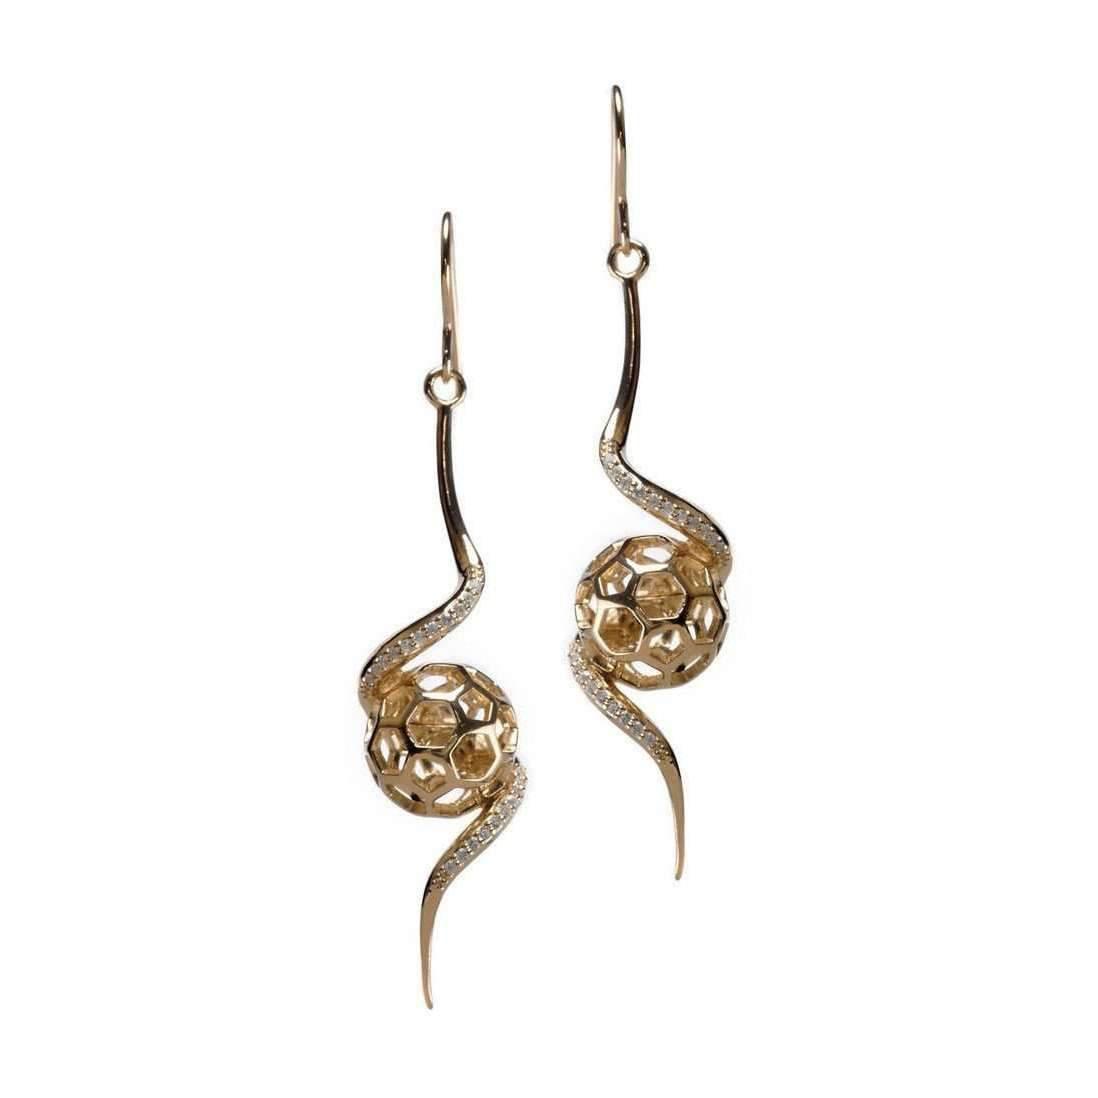 Gia Belloni Gold Polished Aeon Earrings tszVX9n